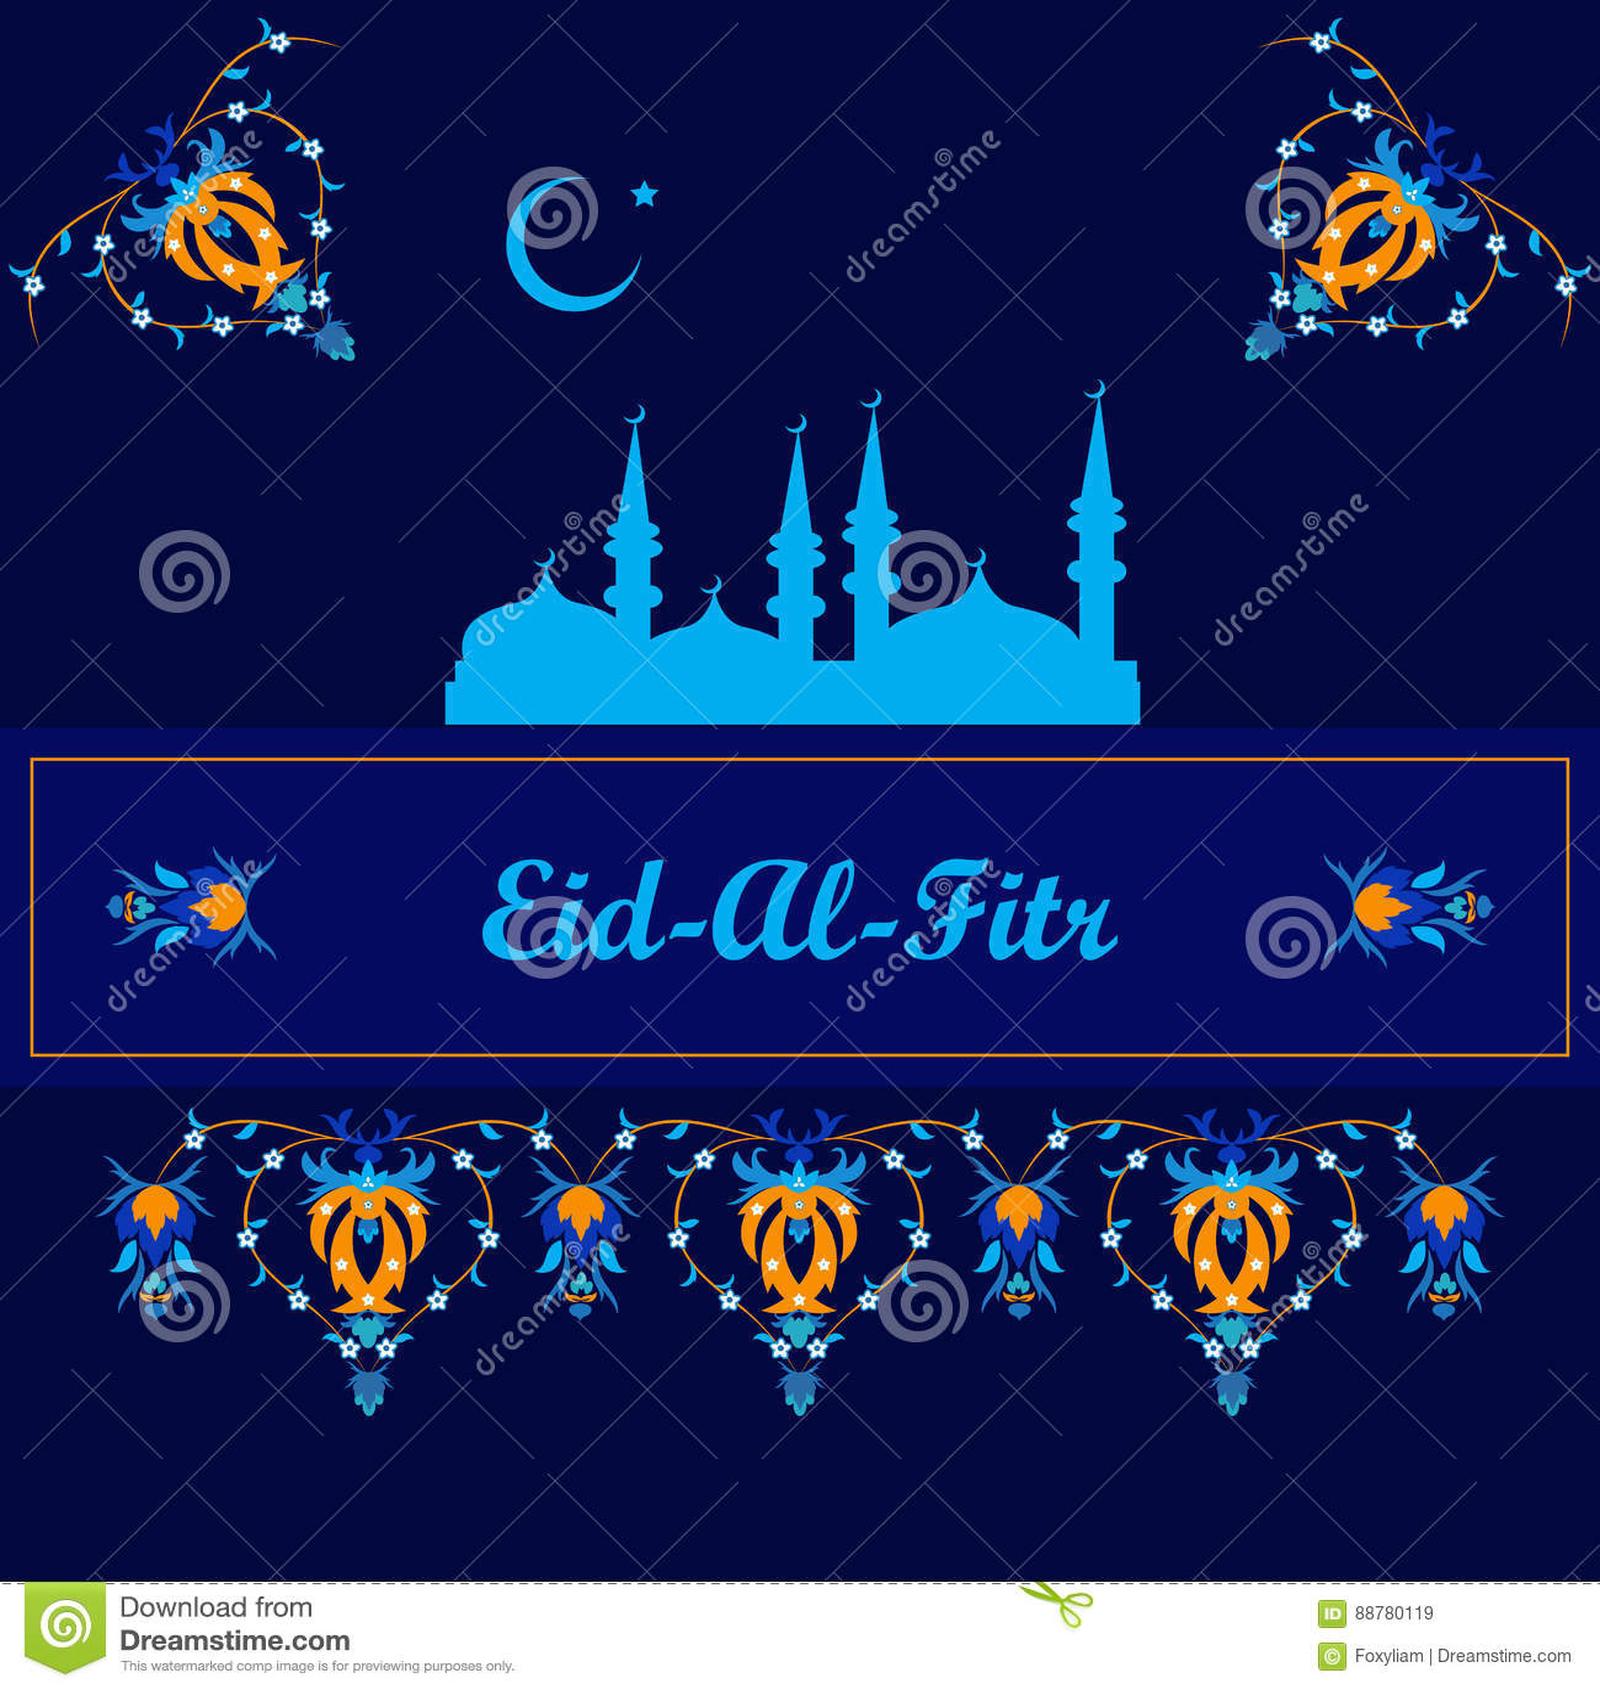 Good Special Eid Al-Fitr Greeting - muslim-community-festival-eid-al-fitr-eid-mubarak-happy-eid-greeting-background-vector-illustration-88780119  HD_85463 .jpg